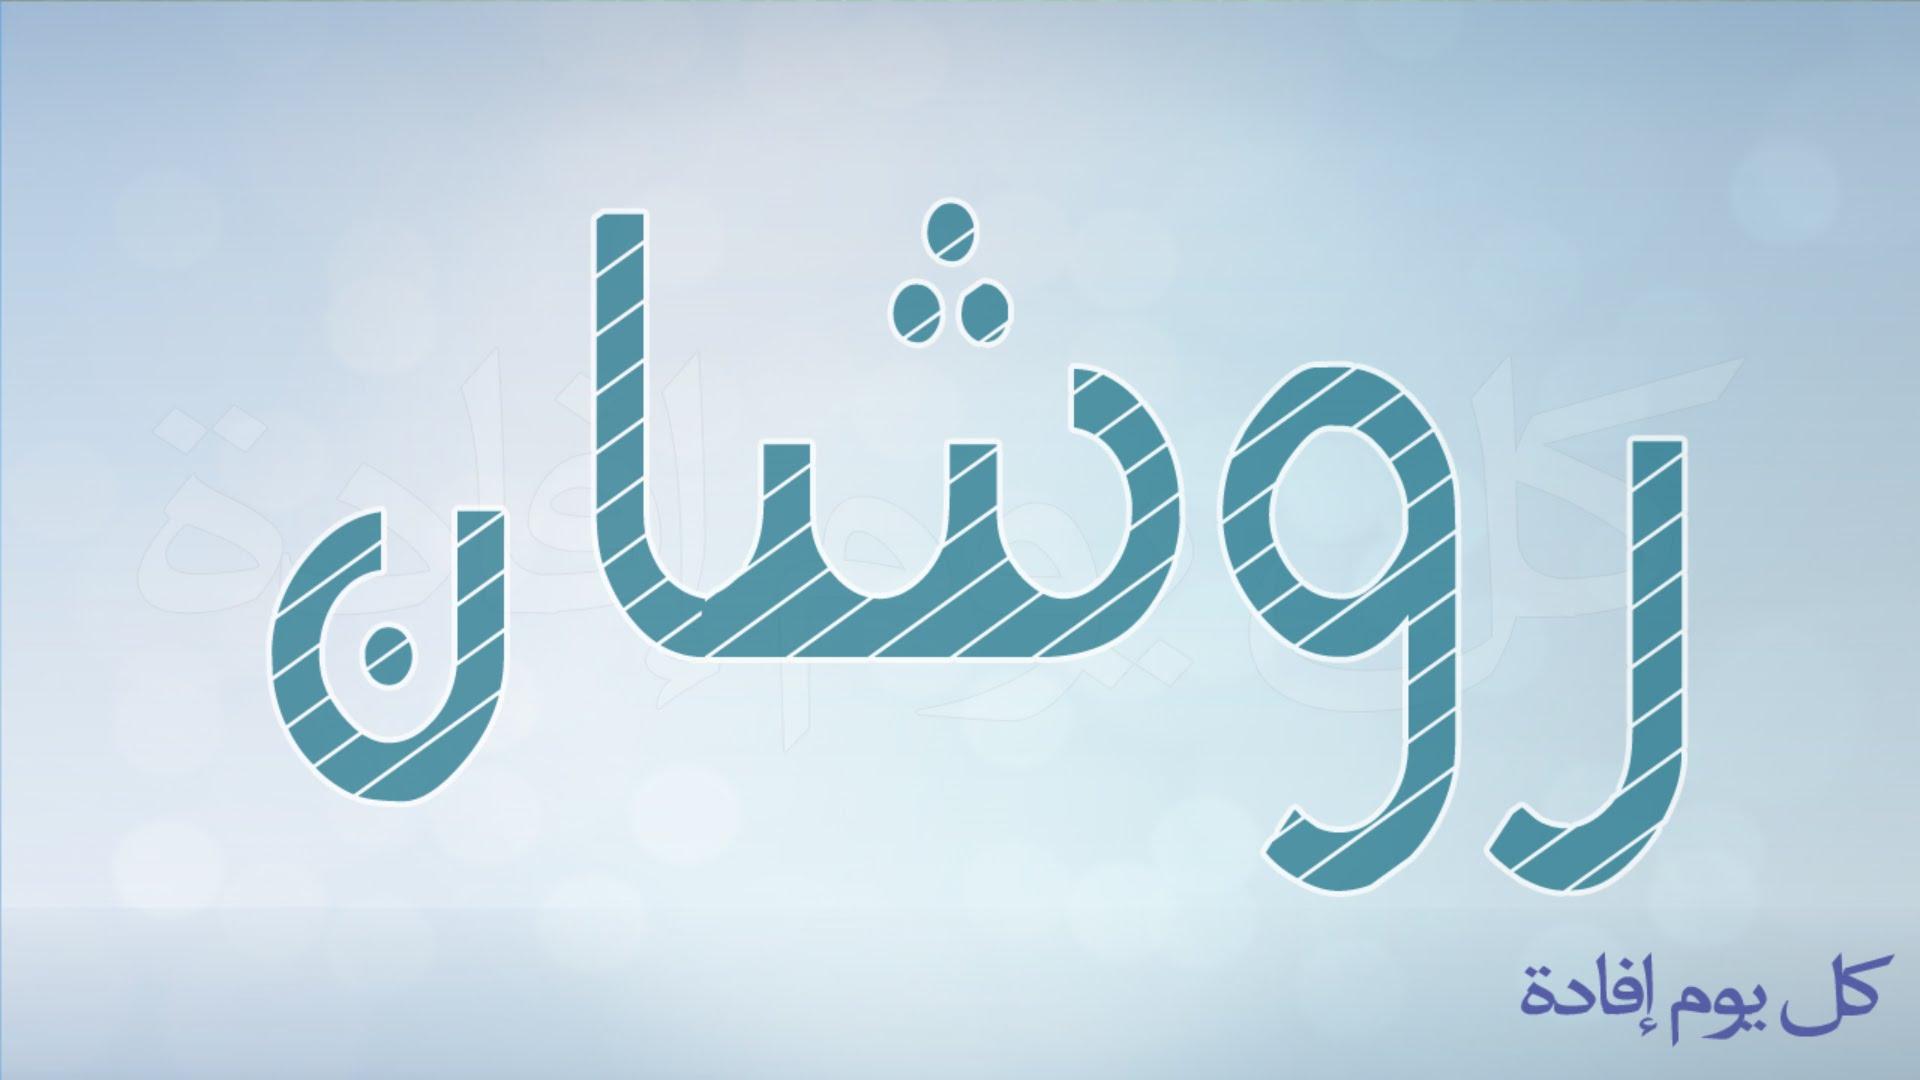 صوره معنى اسم روشان , الاسم الفارسي روشان ومعناه